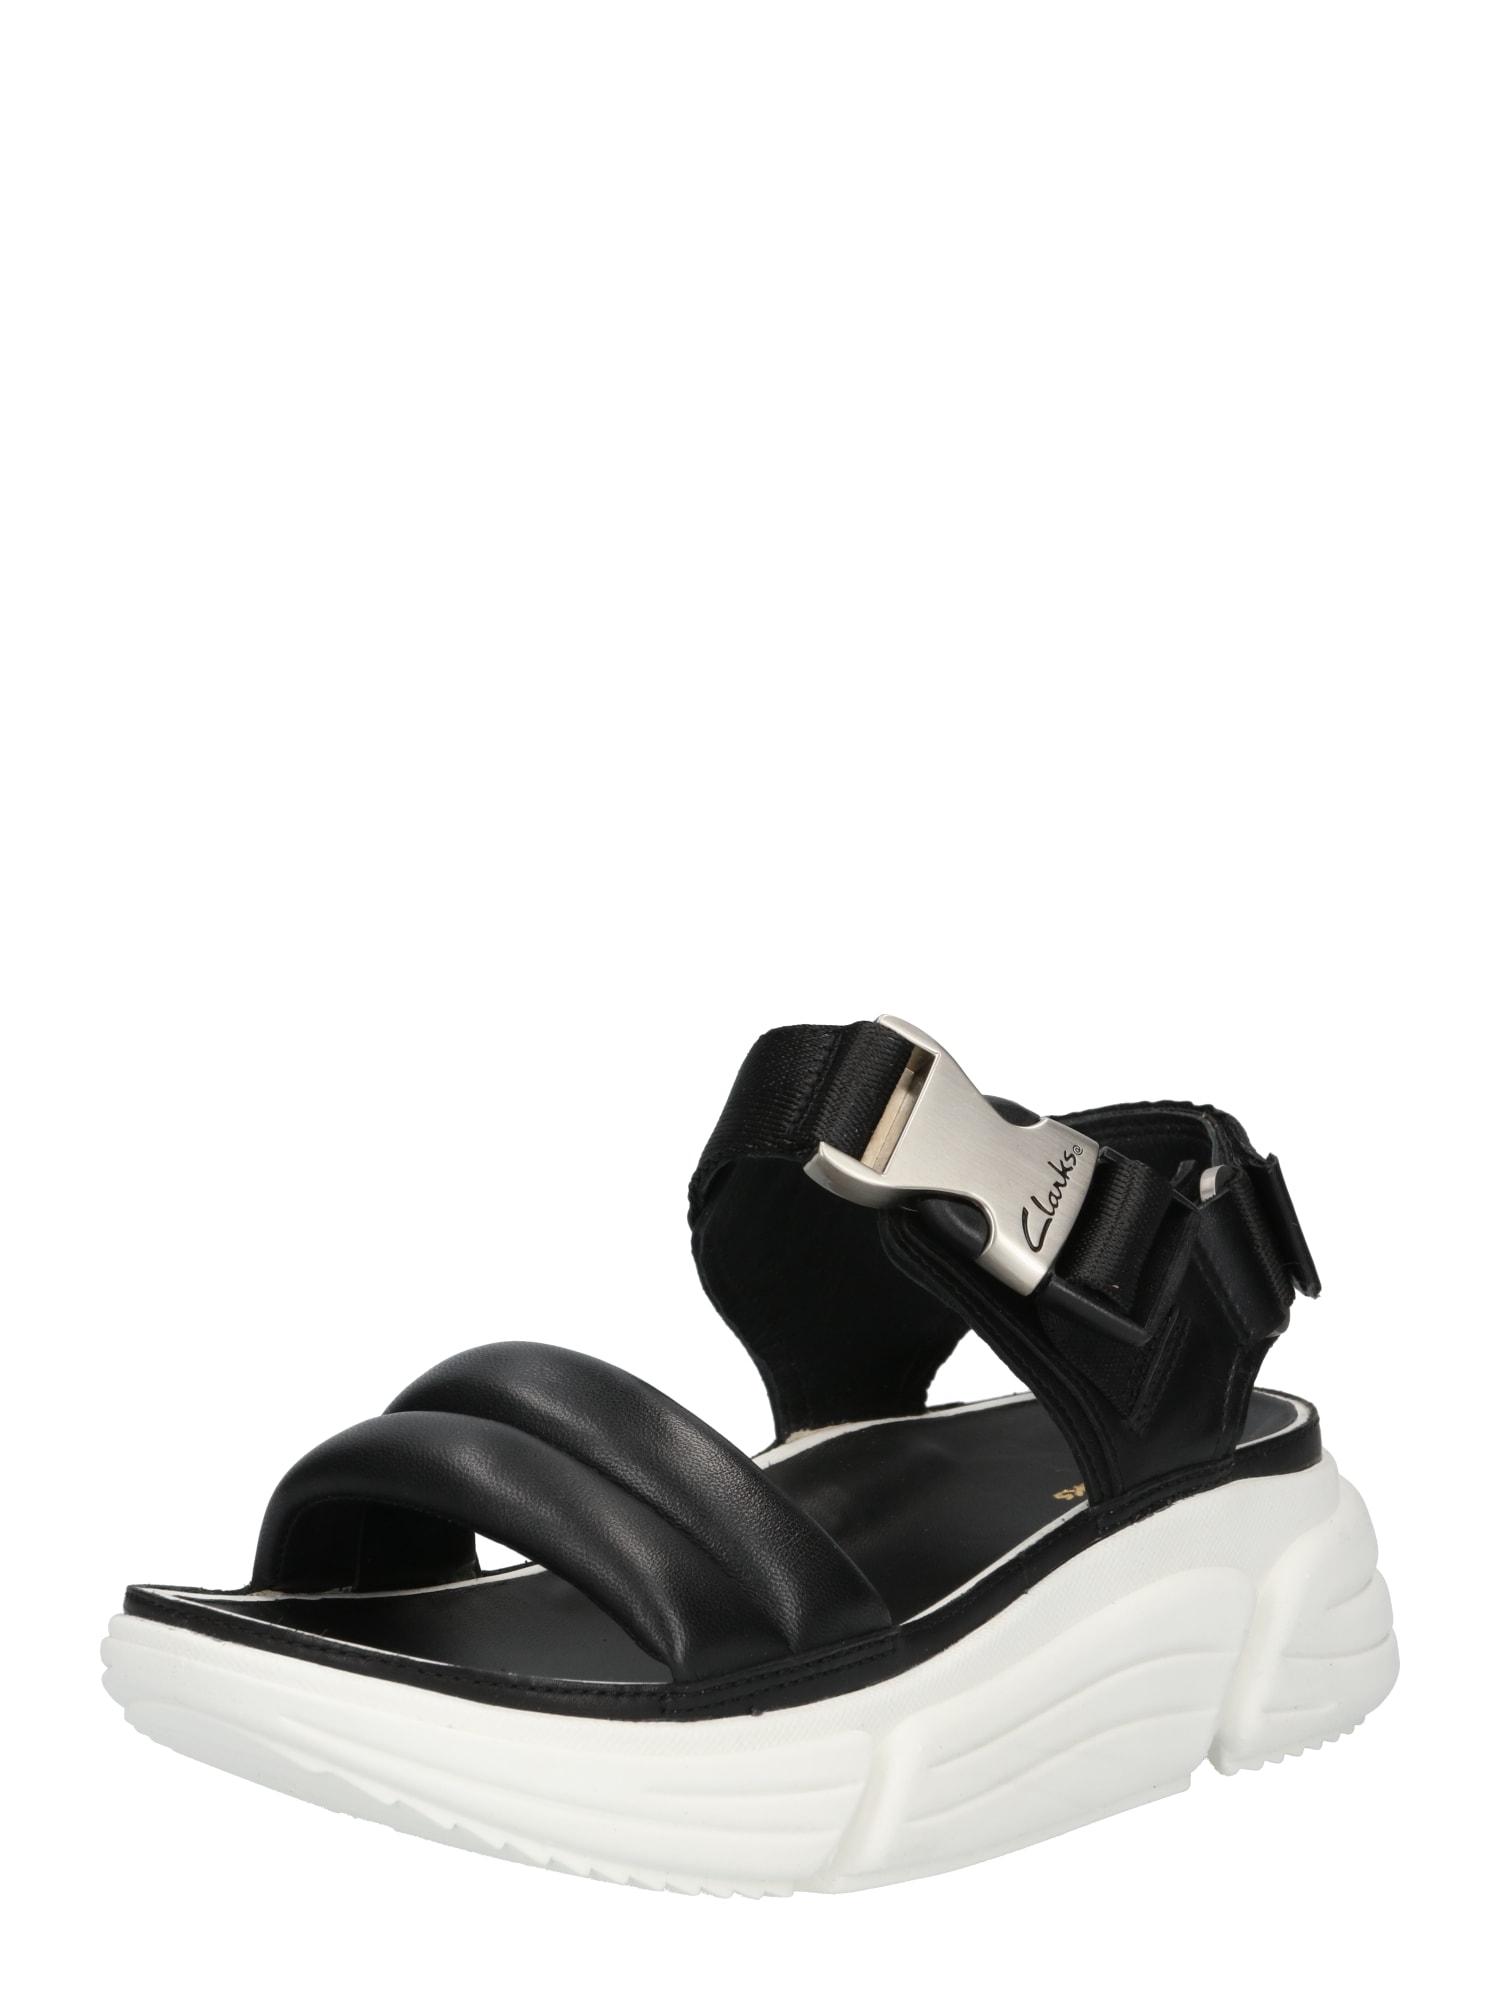 CLARKS Sandalai juoda